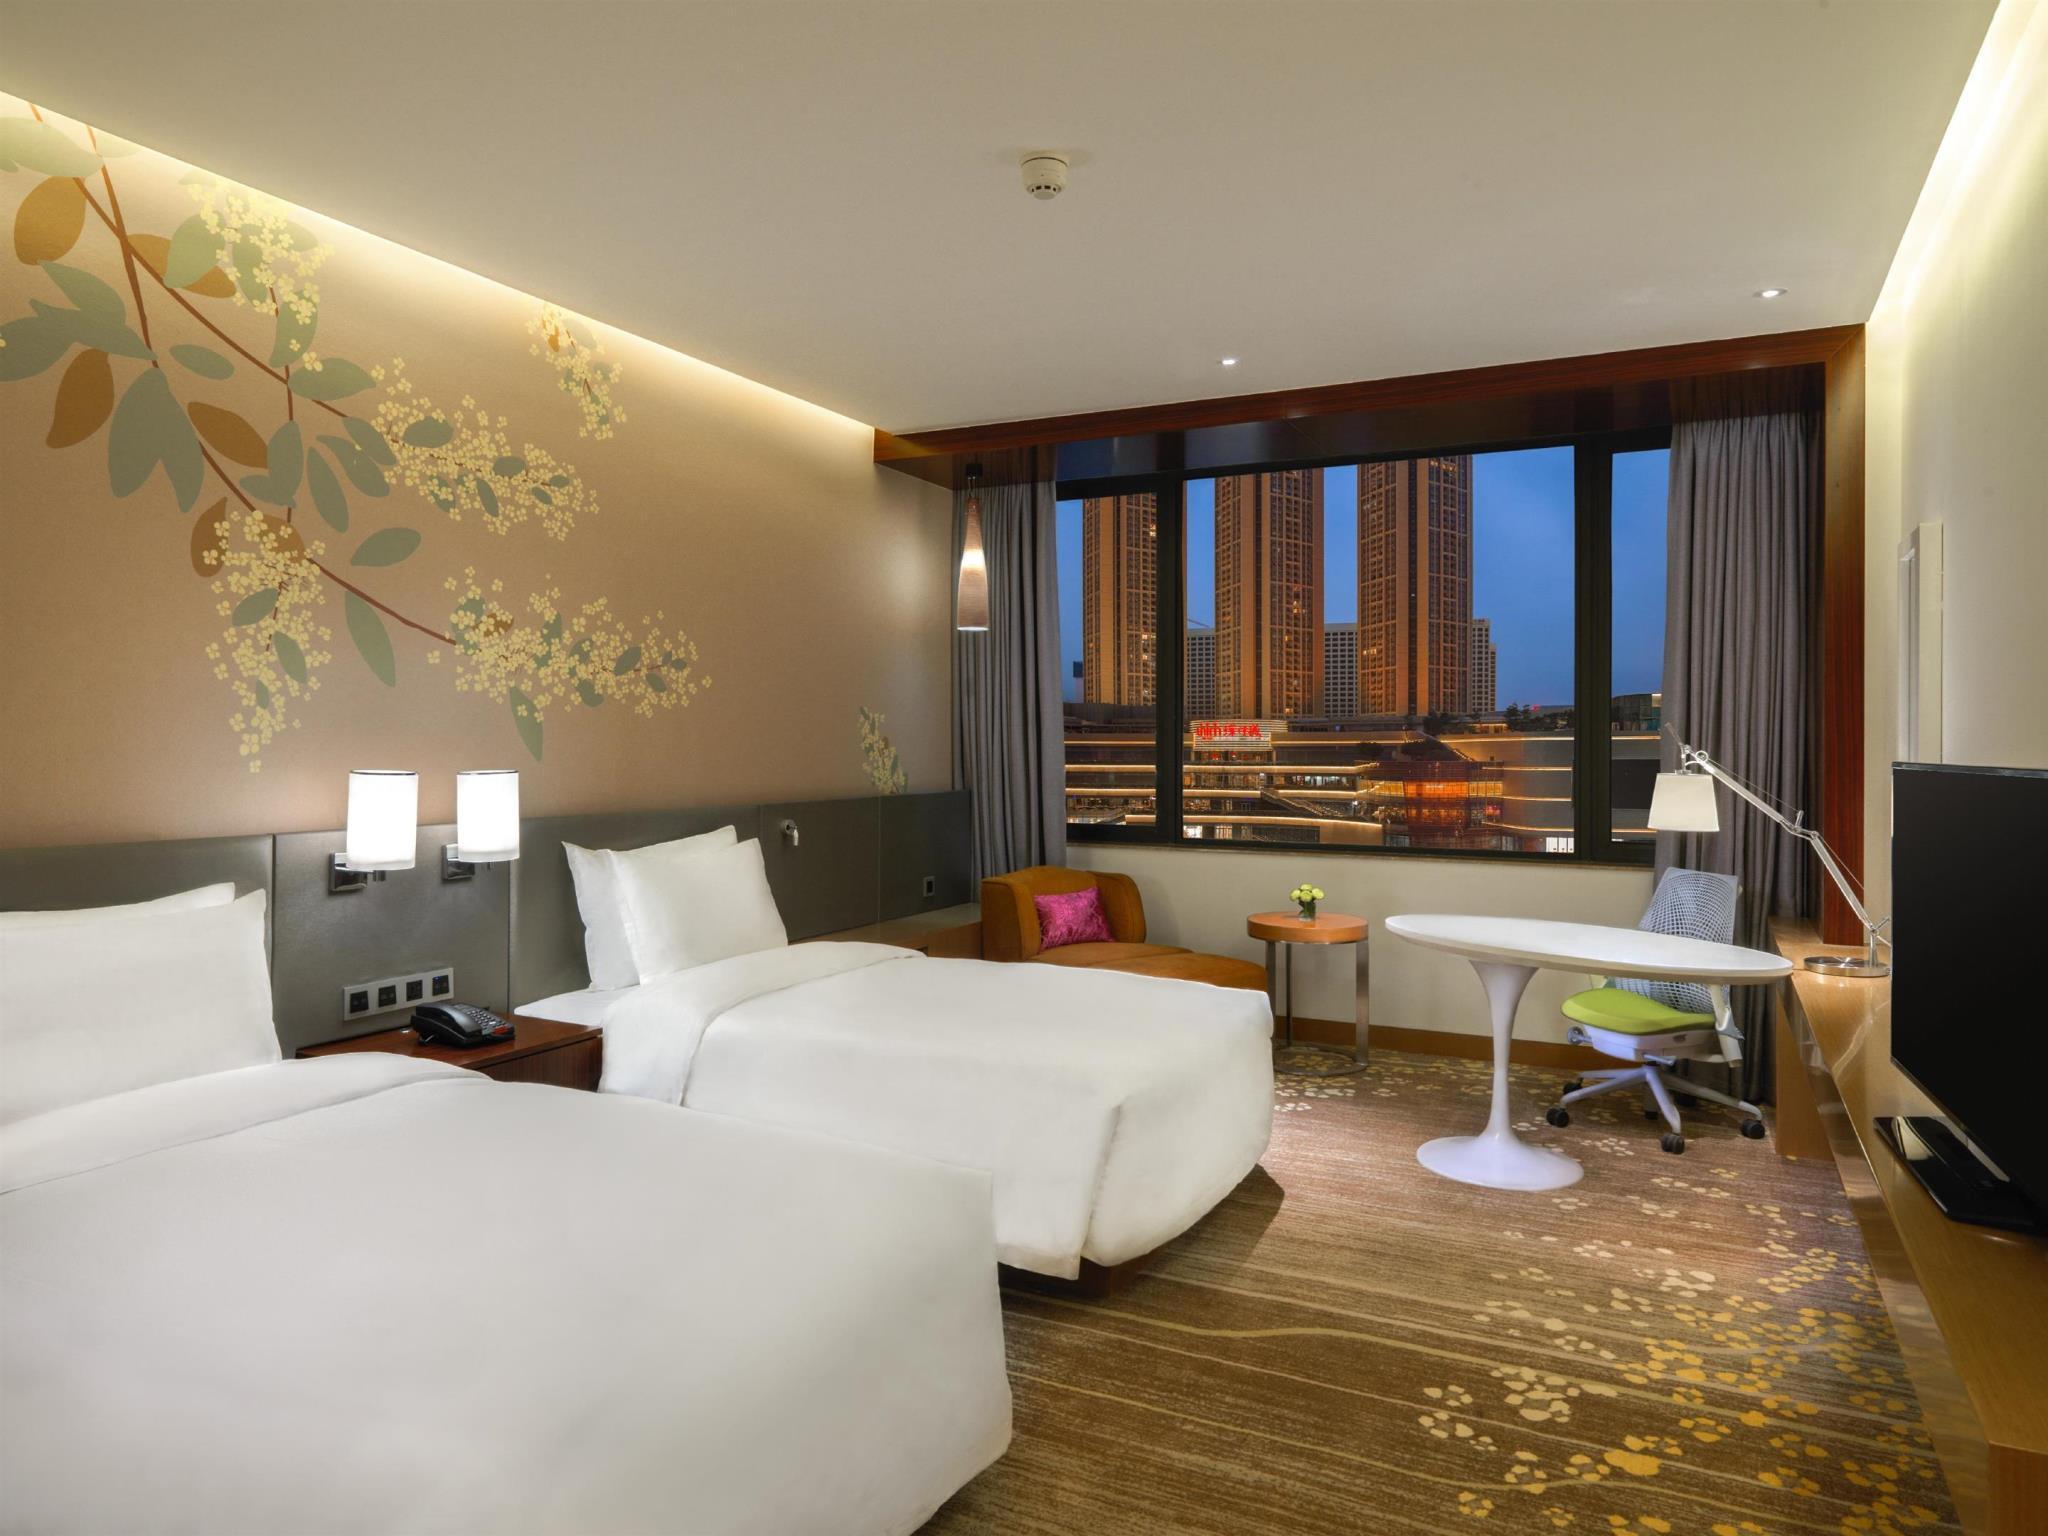 Hilton Garden Inn Foshan in China - Room Deals, Photos & Reviews